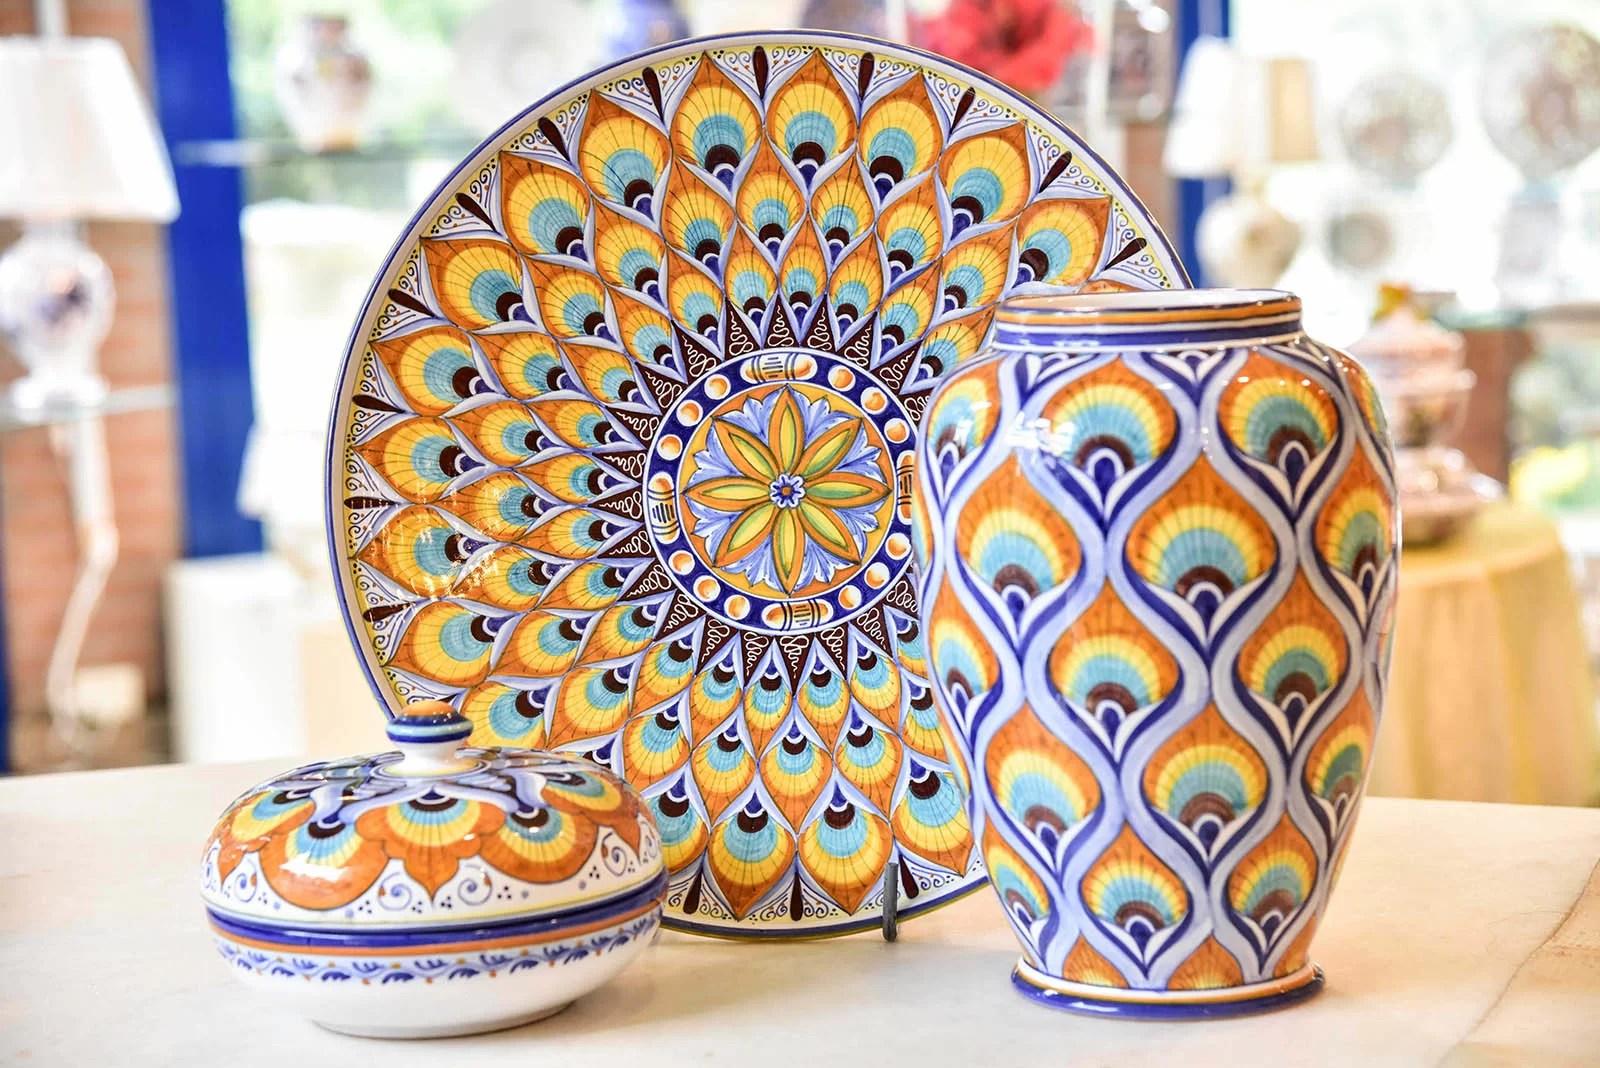 Piastrelle Ceramica Dipinte A Mano